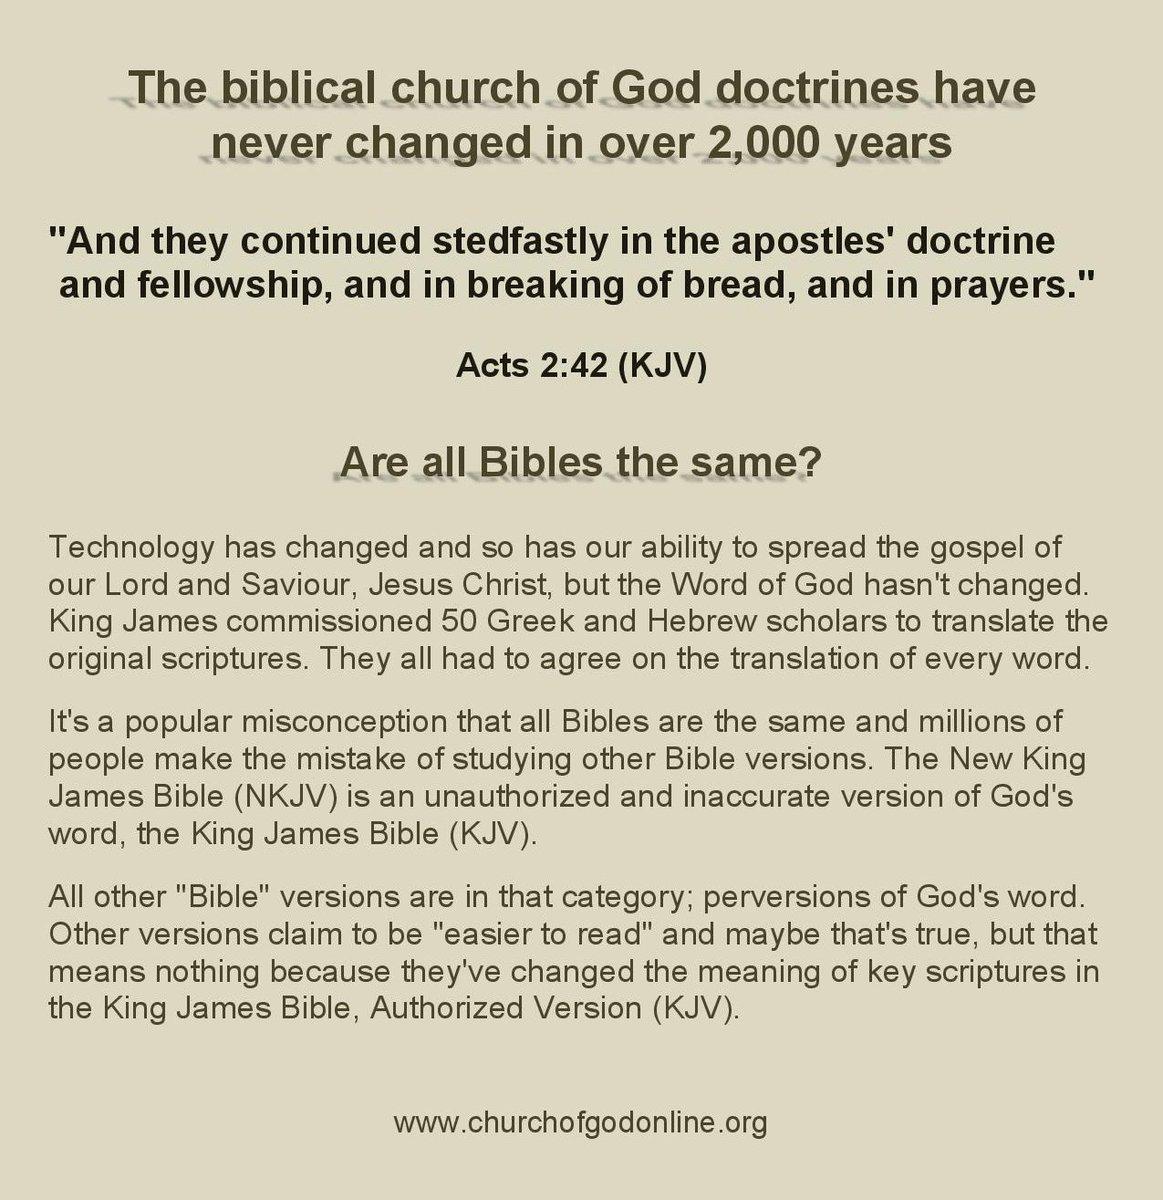 church of God on Twitter: